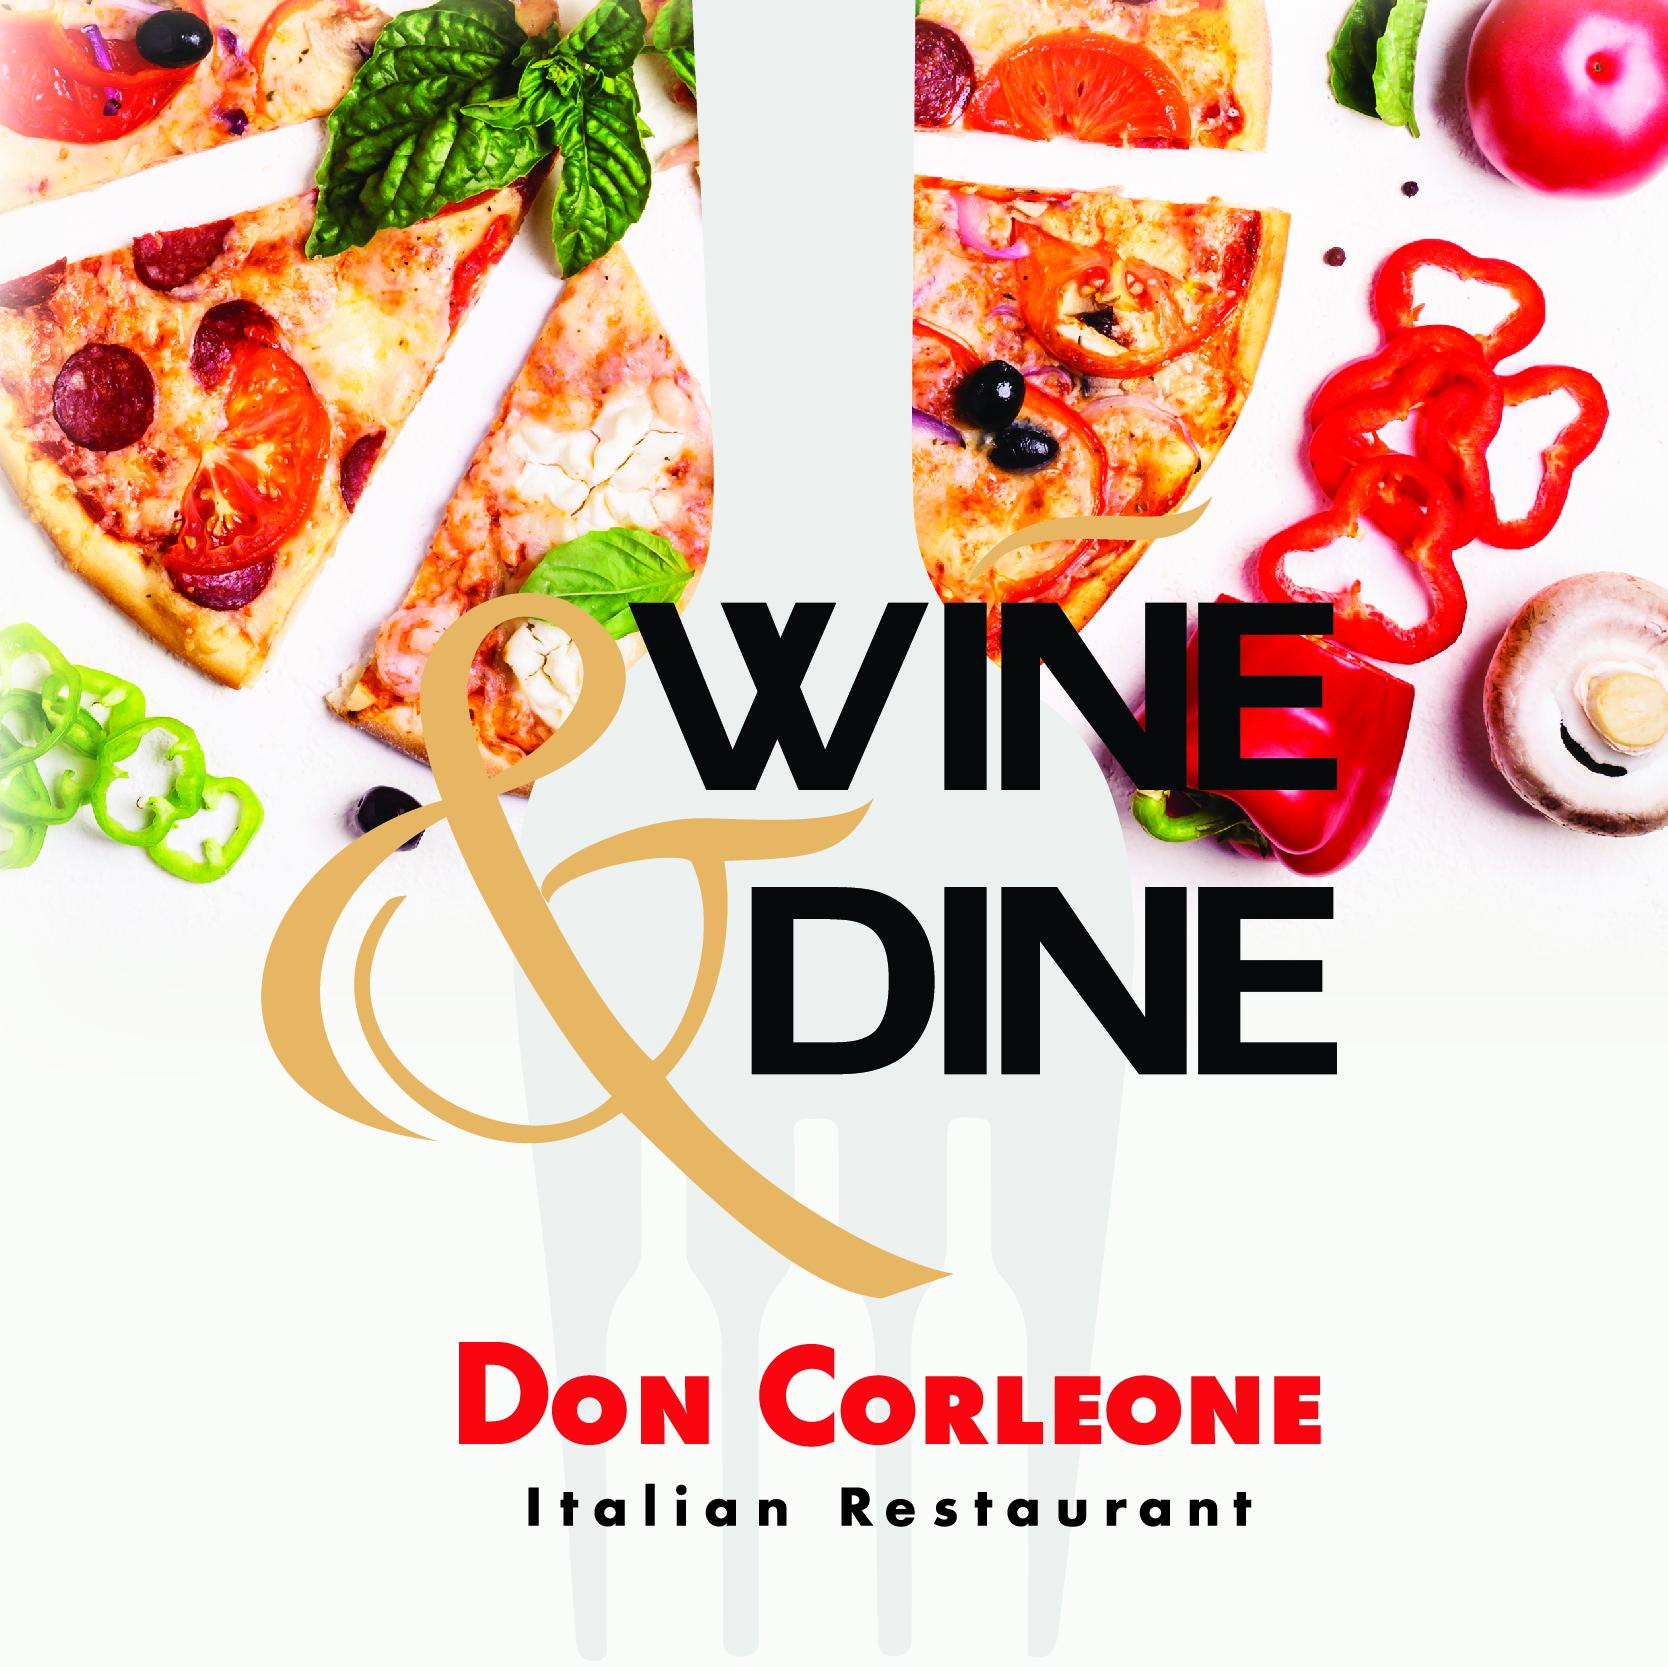 Don Corleone image